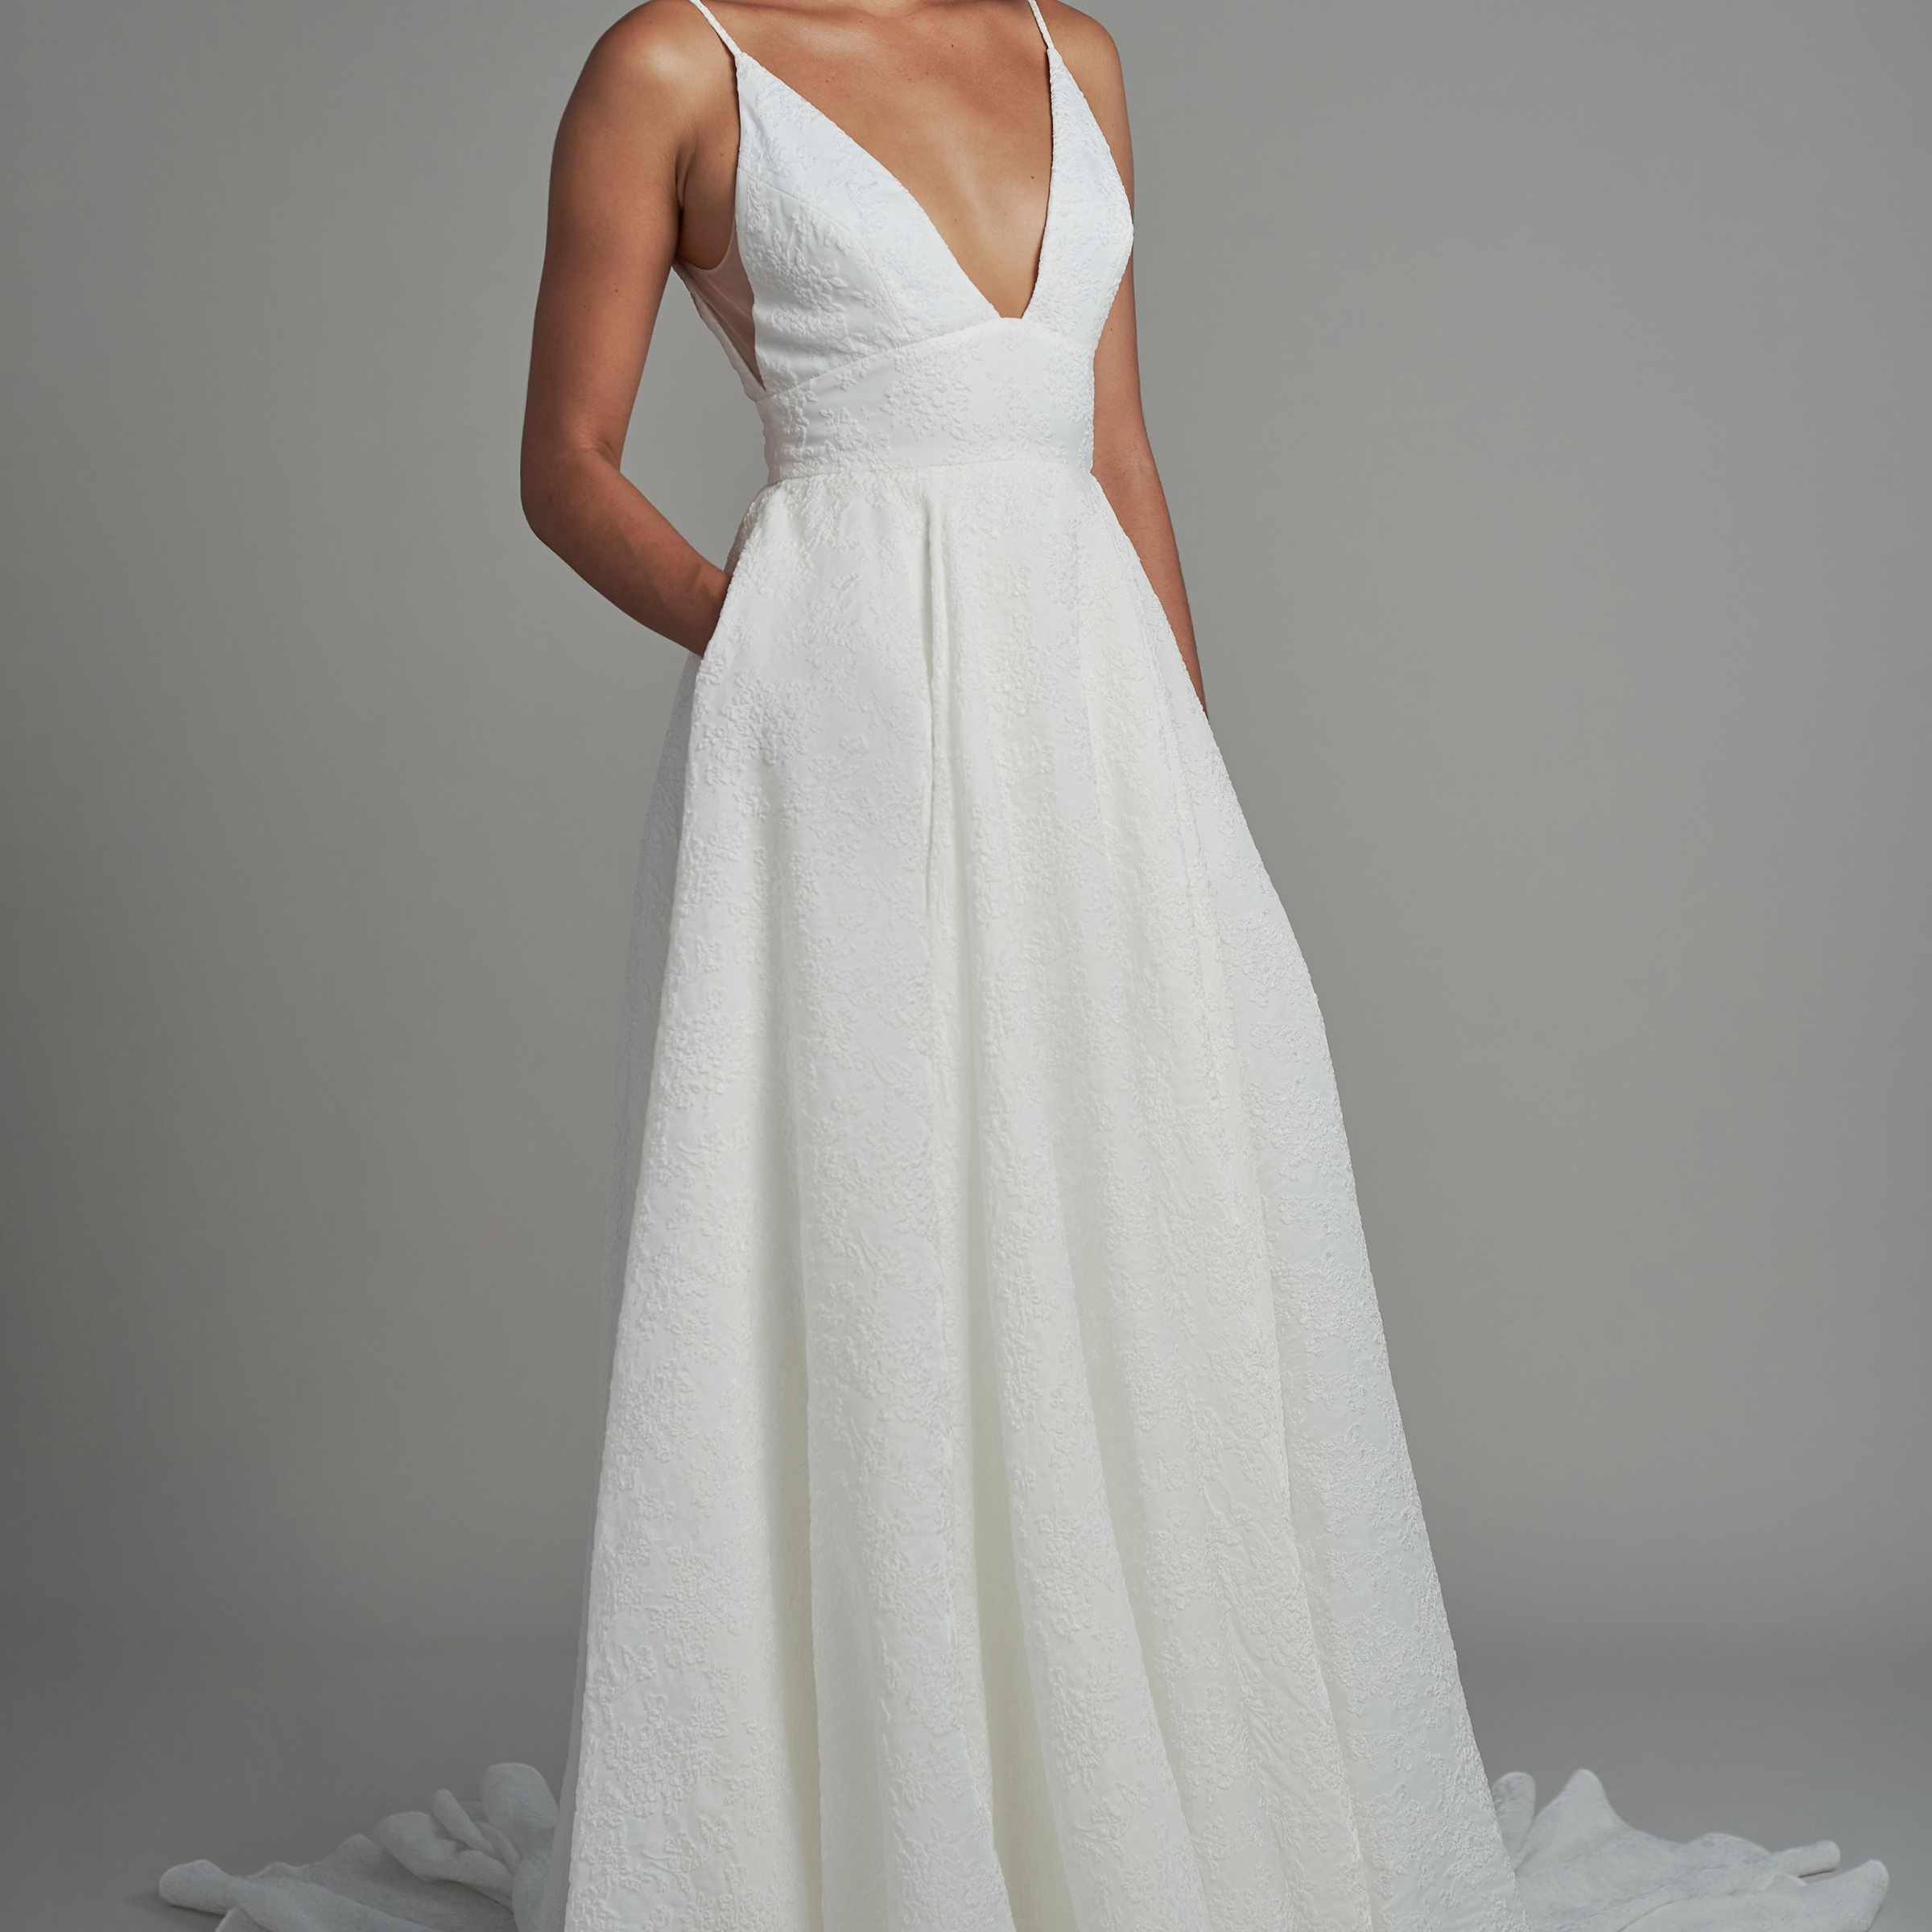 Jenny Yoo Persephone Wedding Gown